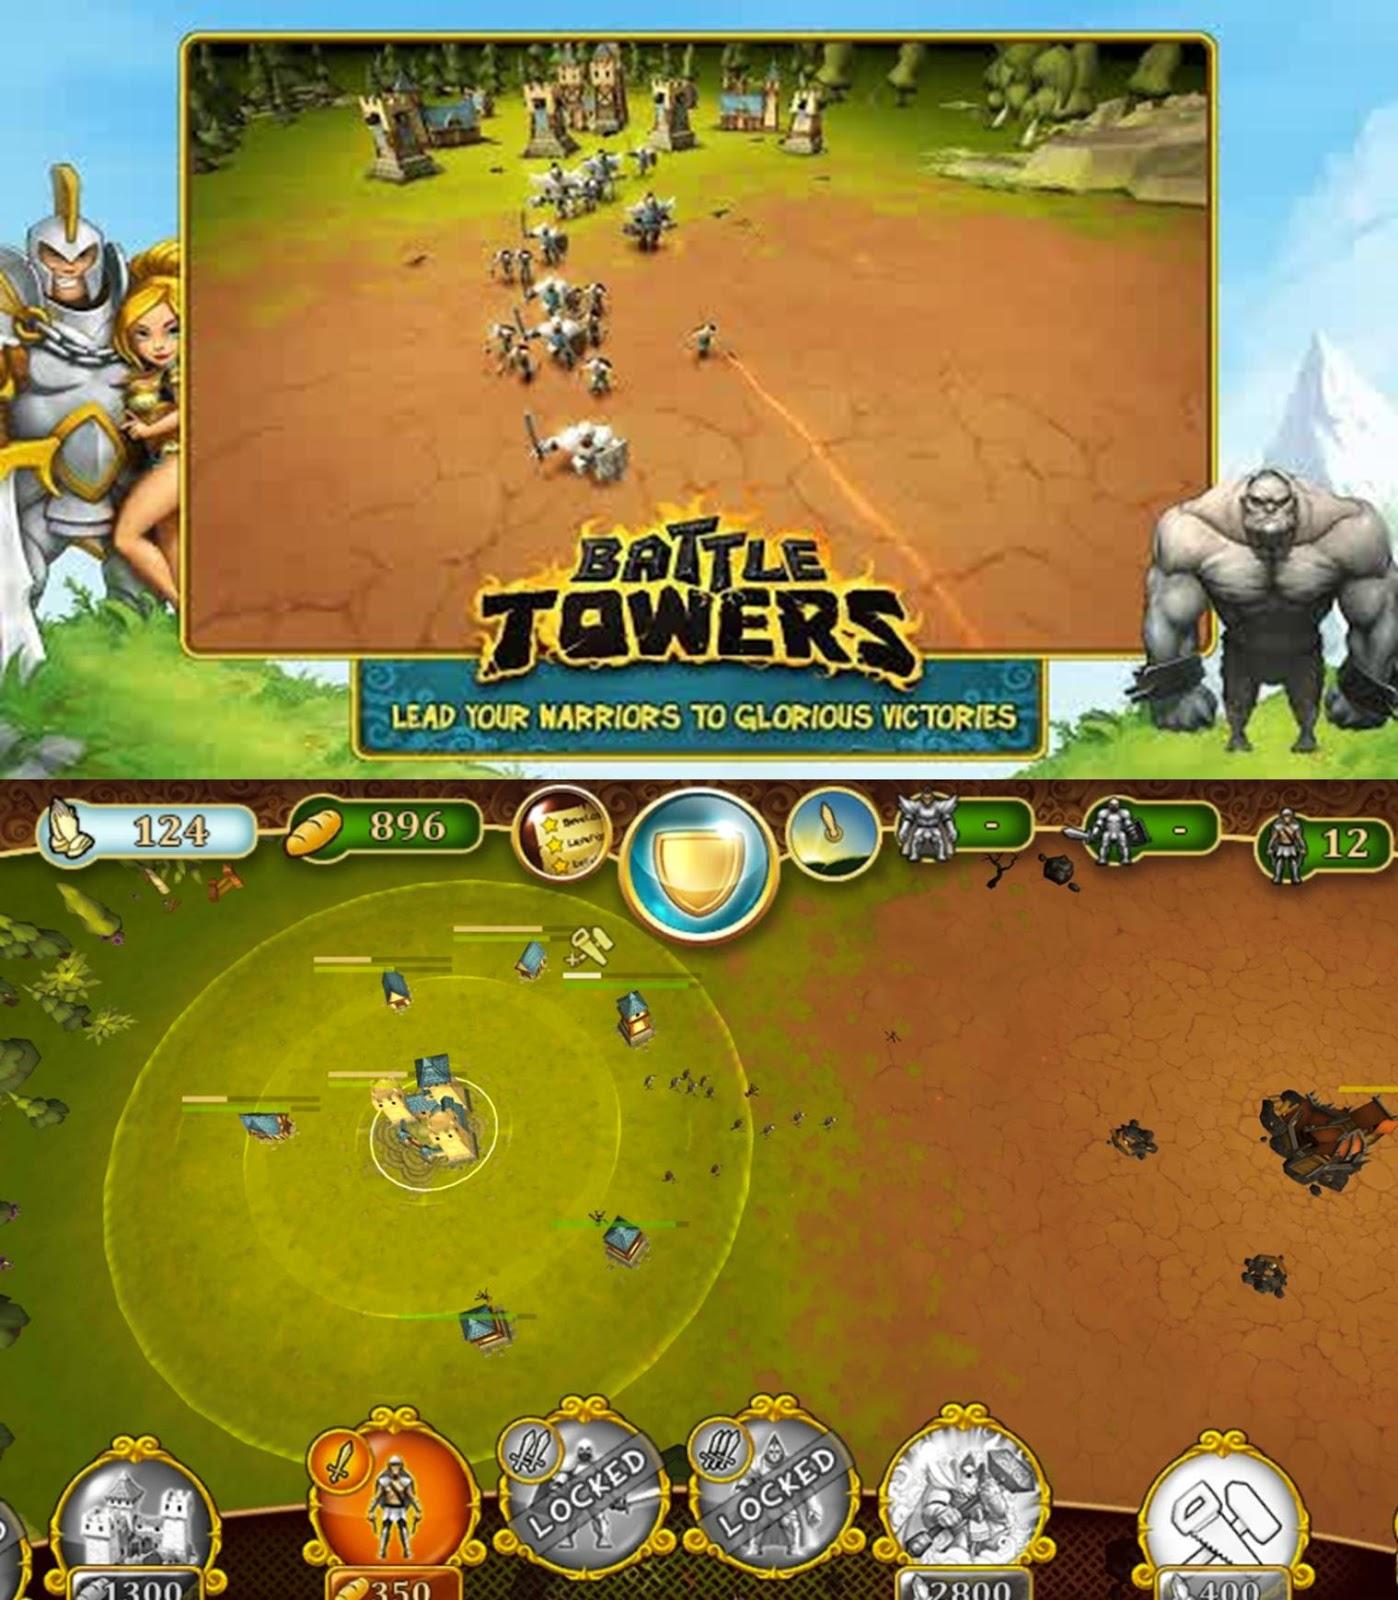 Download Game Warrior Market Mayhem Mod Apk: Download Battle Towers MOD APK (Unlimited Money